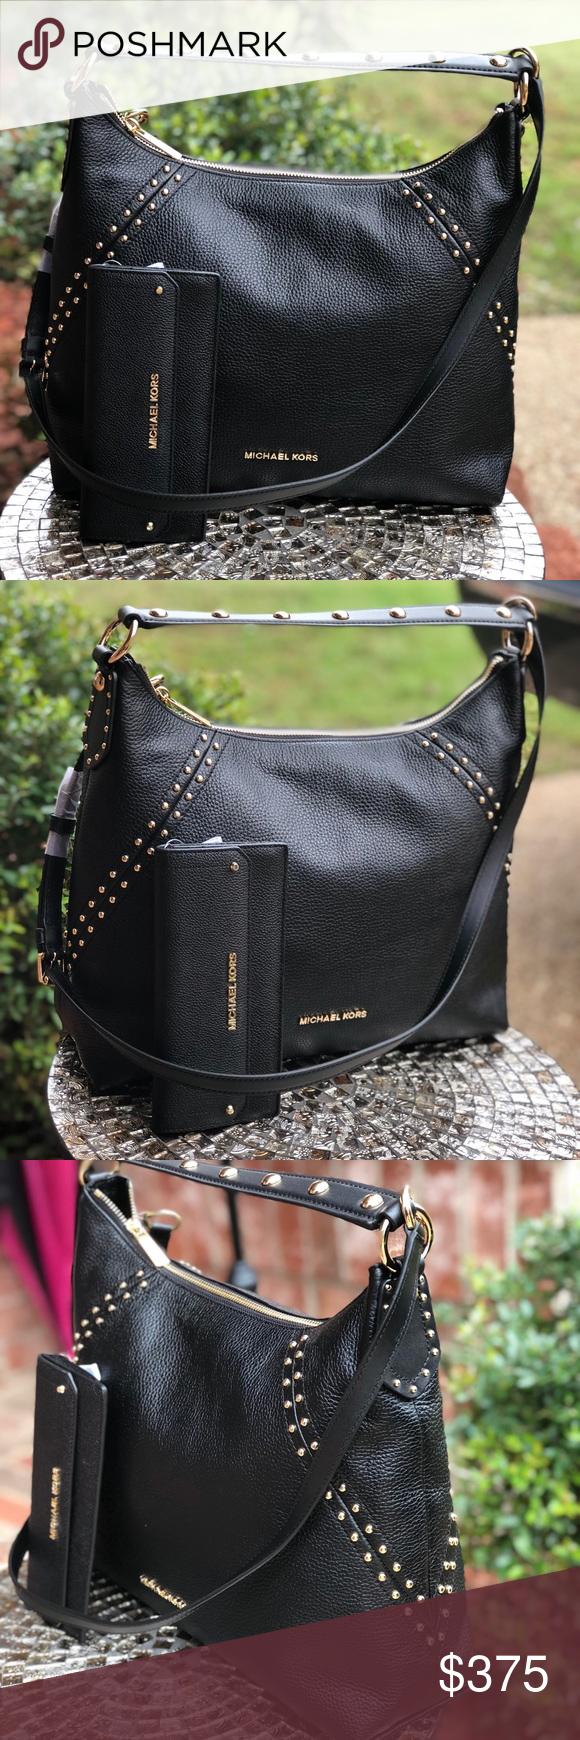 a916345dfe58f4 Michael kors medium studded Aria bag+wallet set STYLE: 35T8GXAL8LColor:  BlackFrom Michael Michael